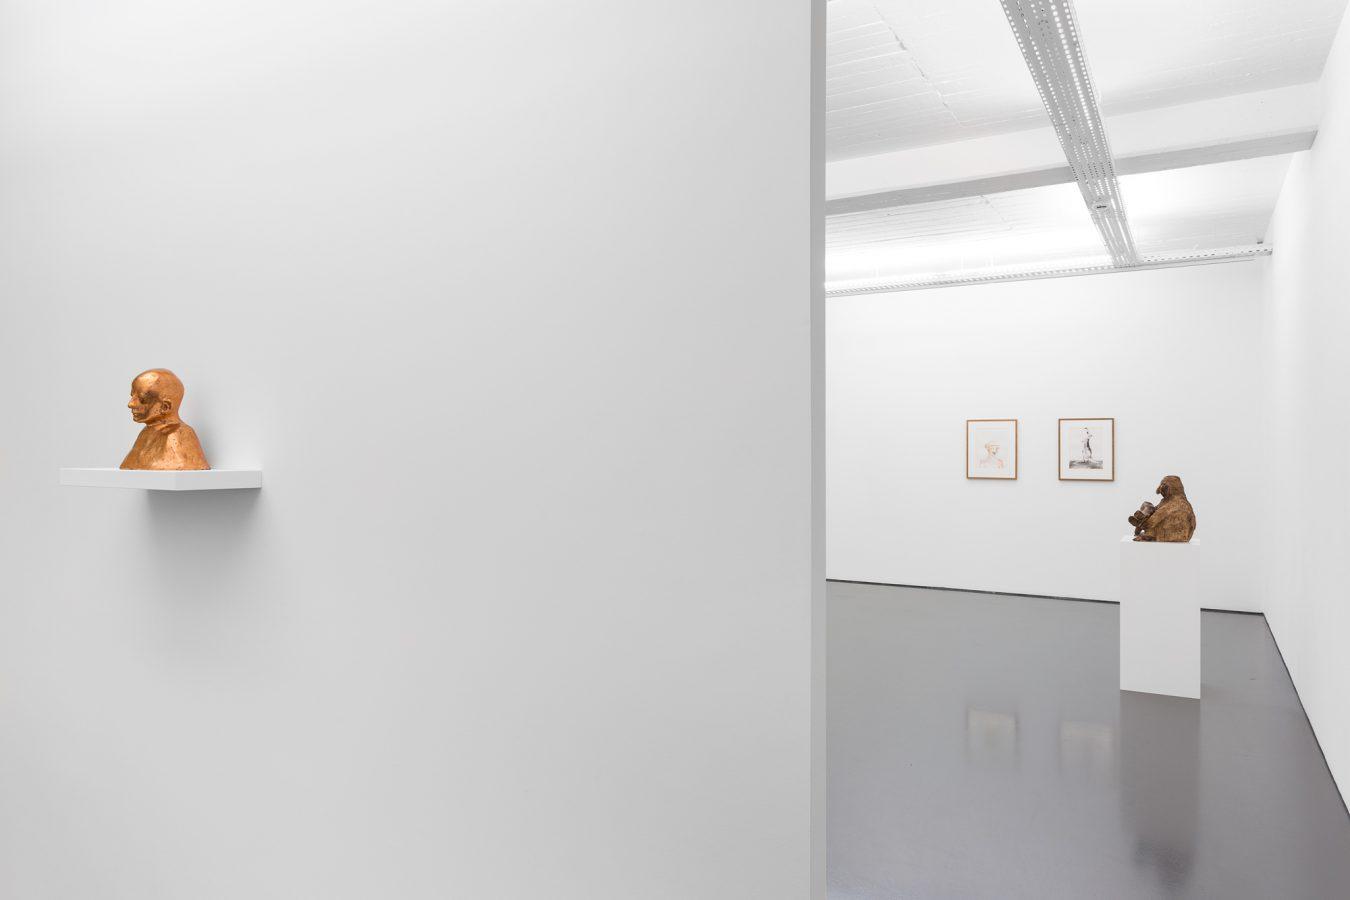 Galeria Pedro Cera –  - Paloma Varga Weisz